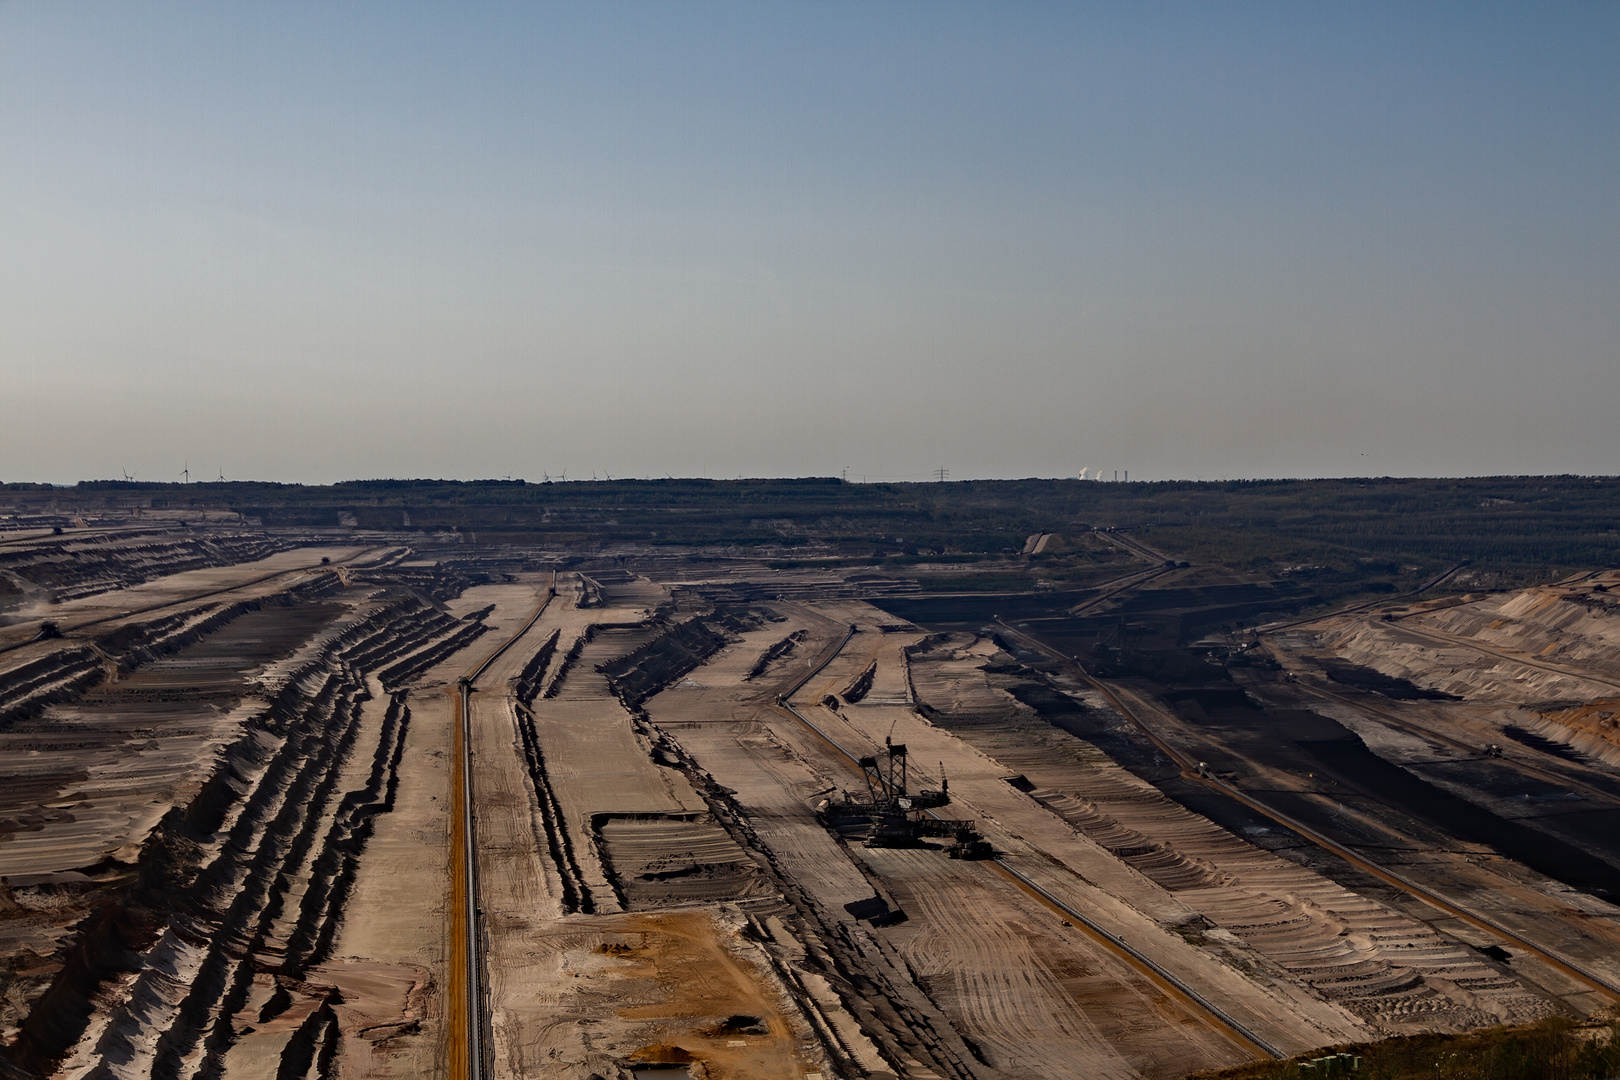 Der Tagebau Hambach